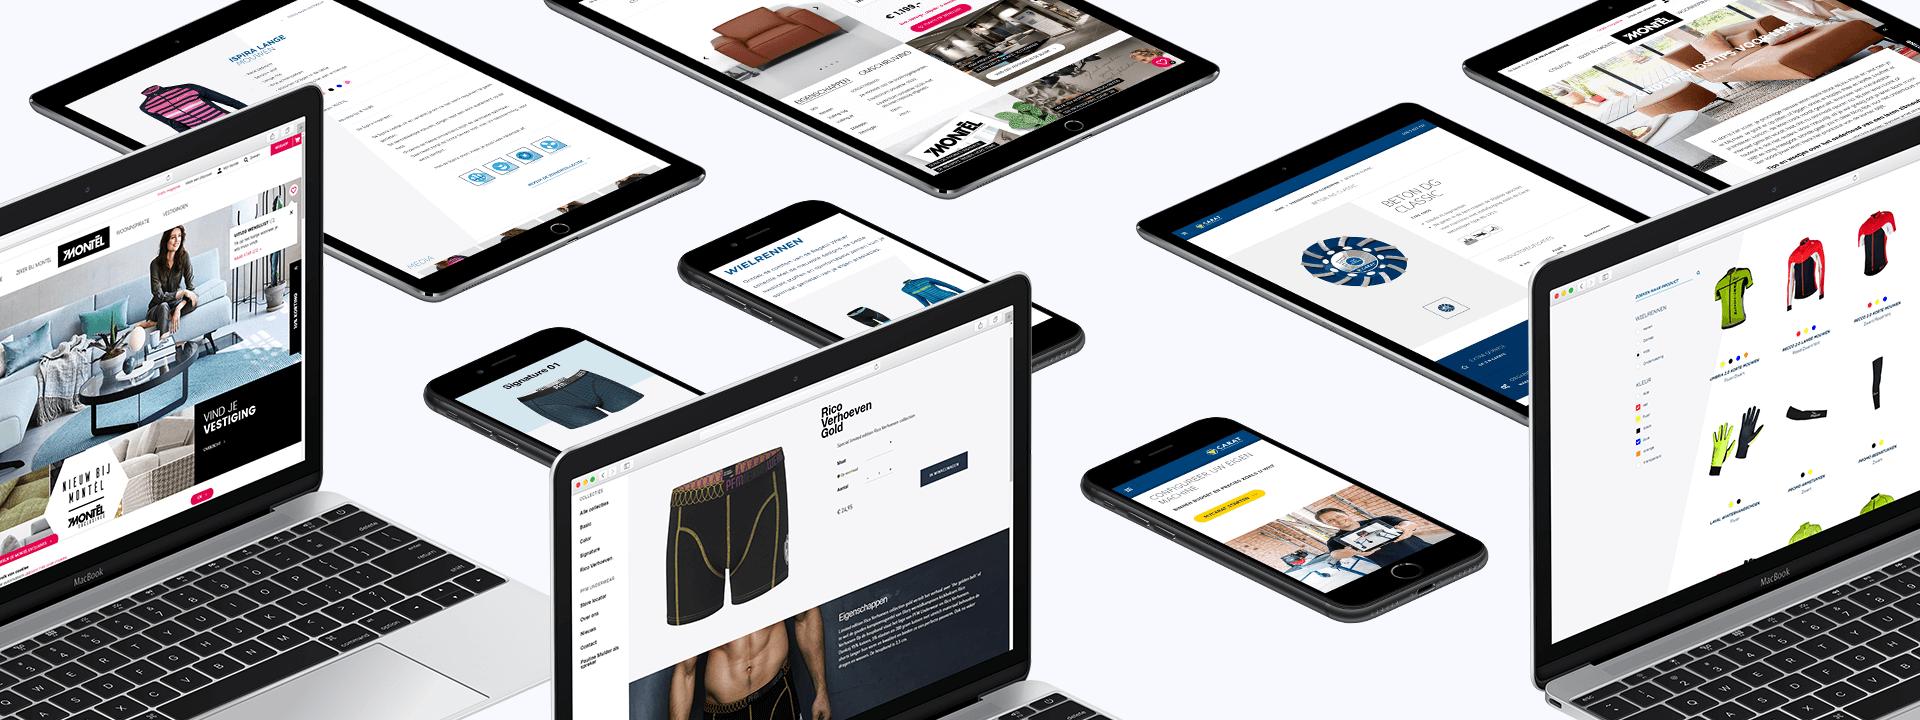 Webwinkel ontwikkeling Breda